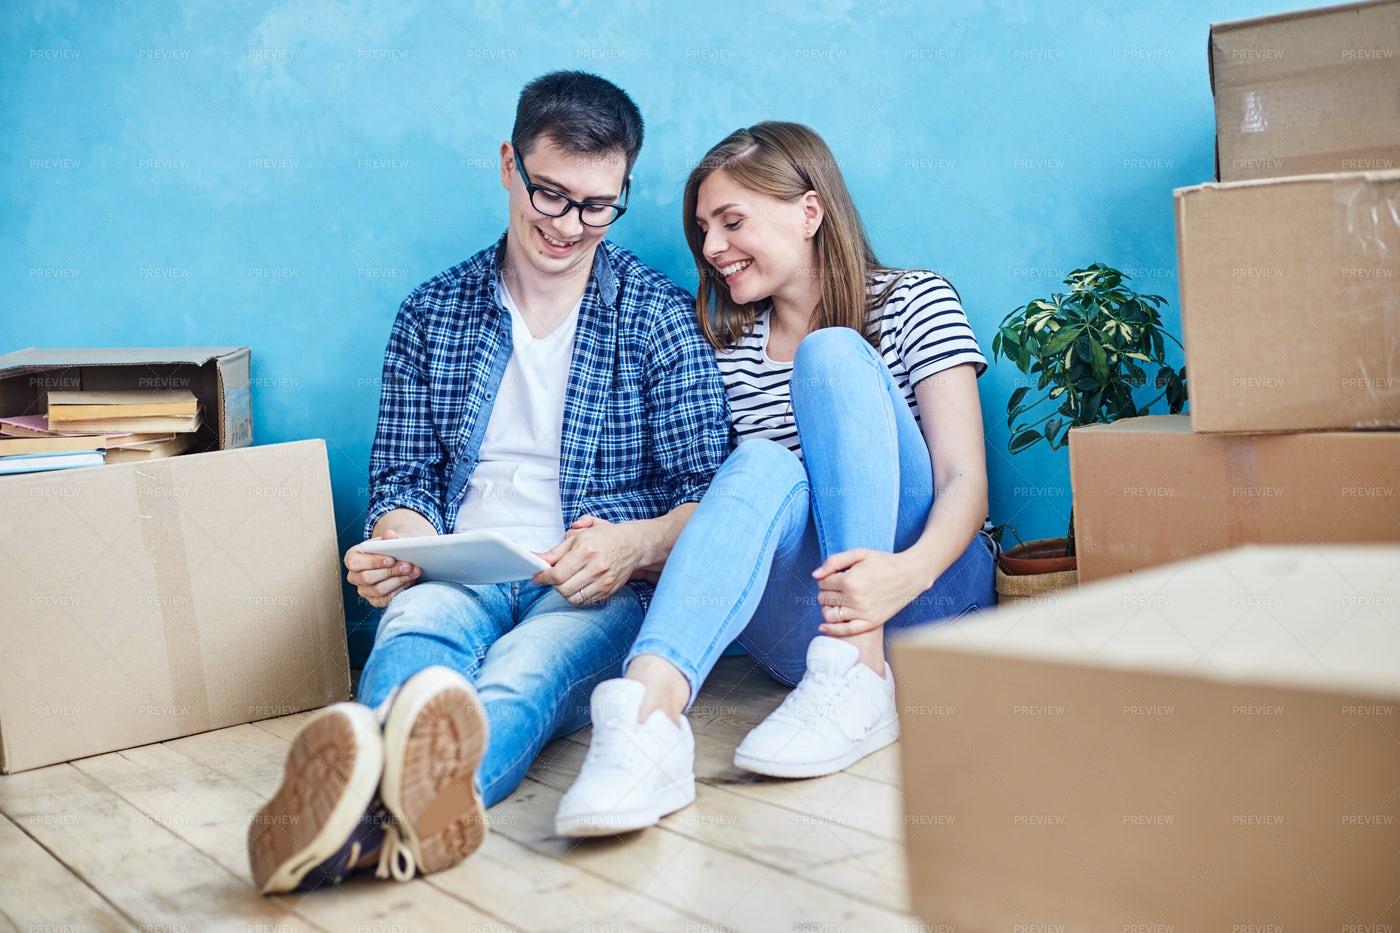 Adorable Couple In New Apartment: Stock Photos